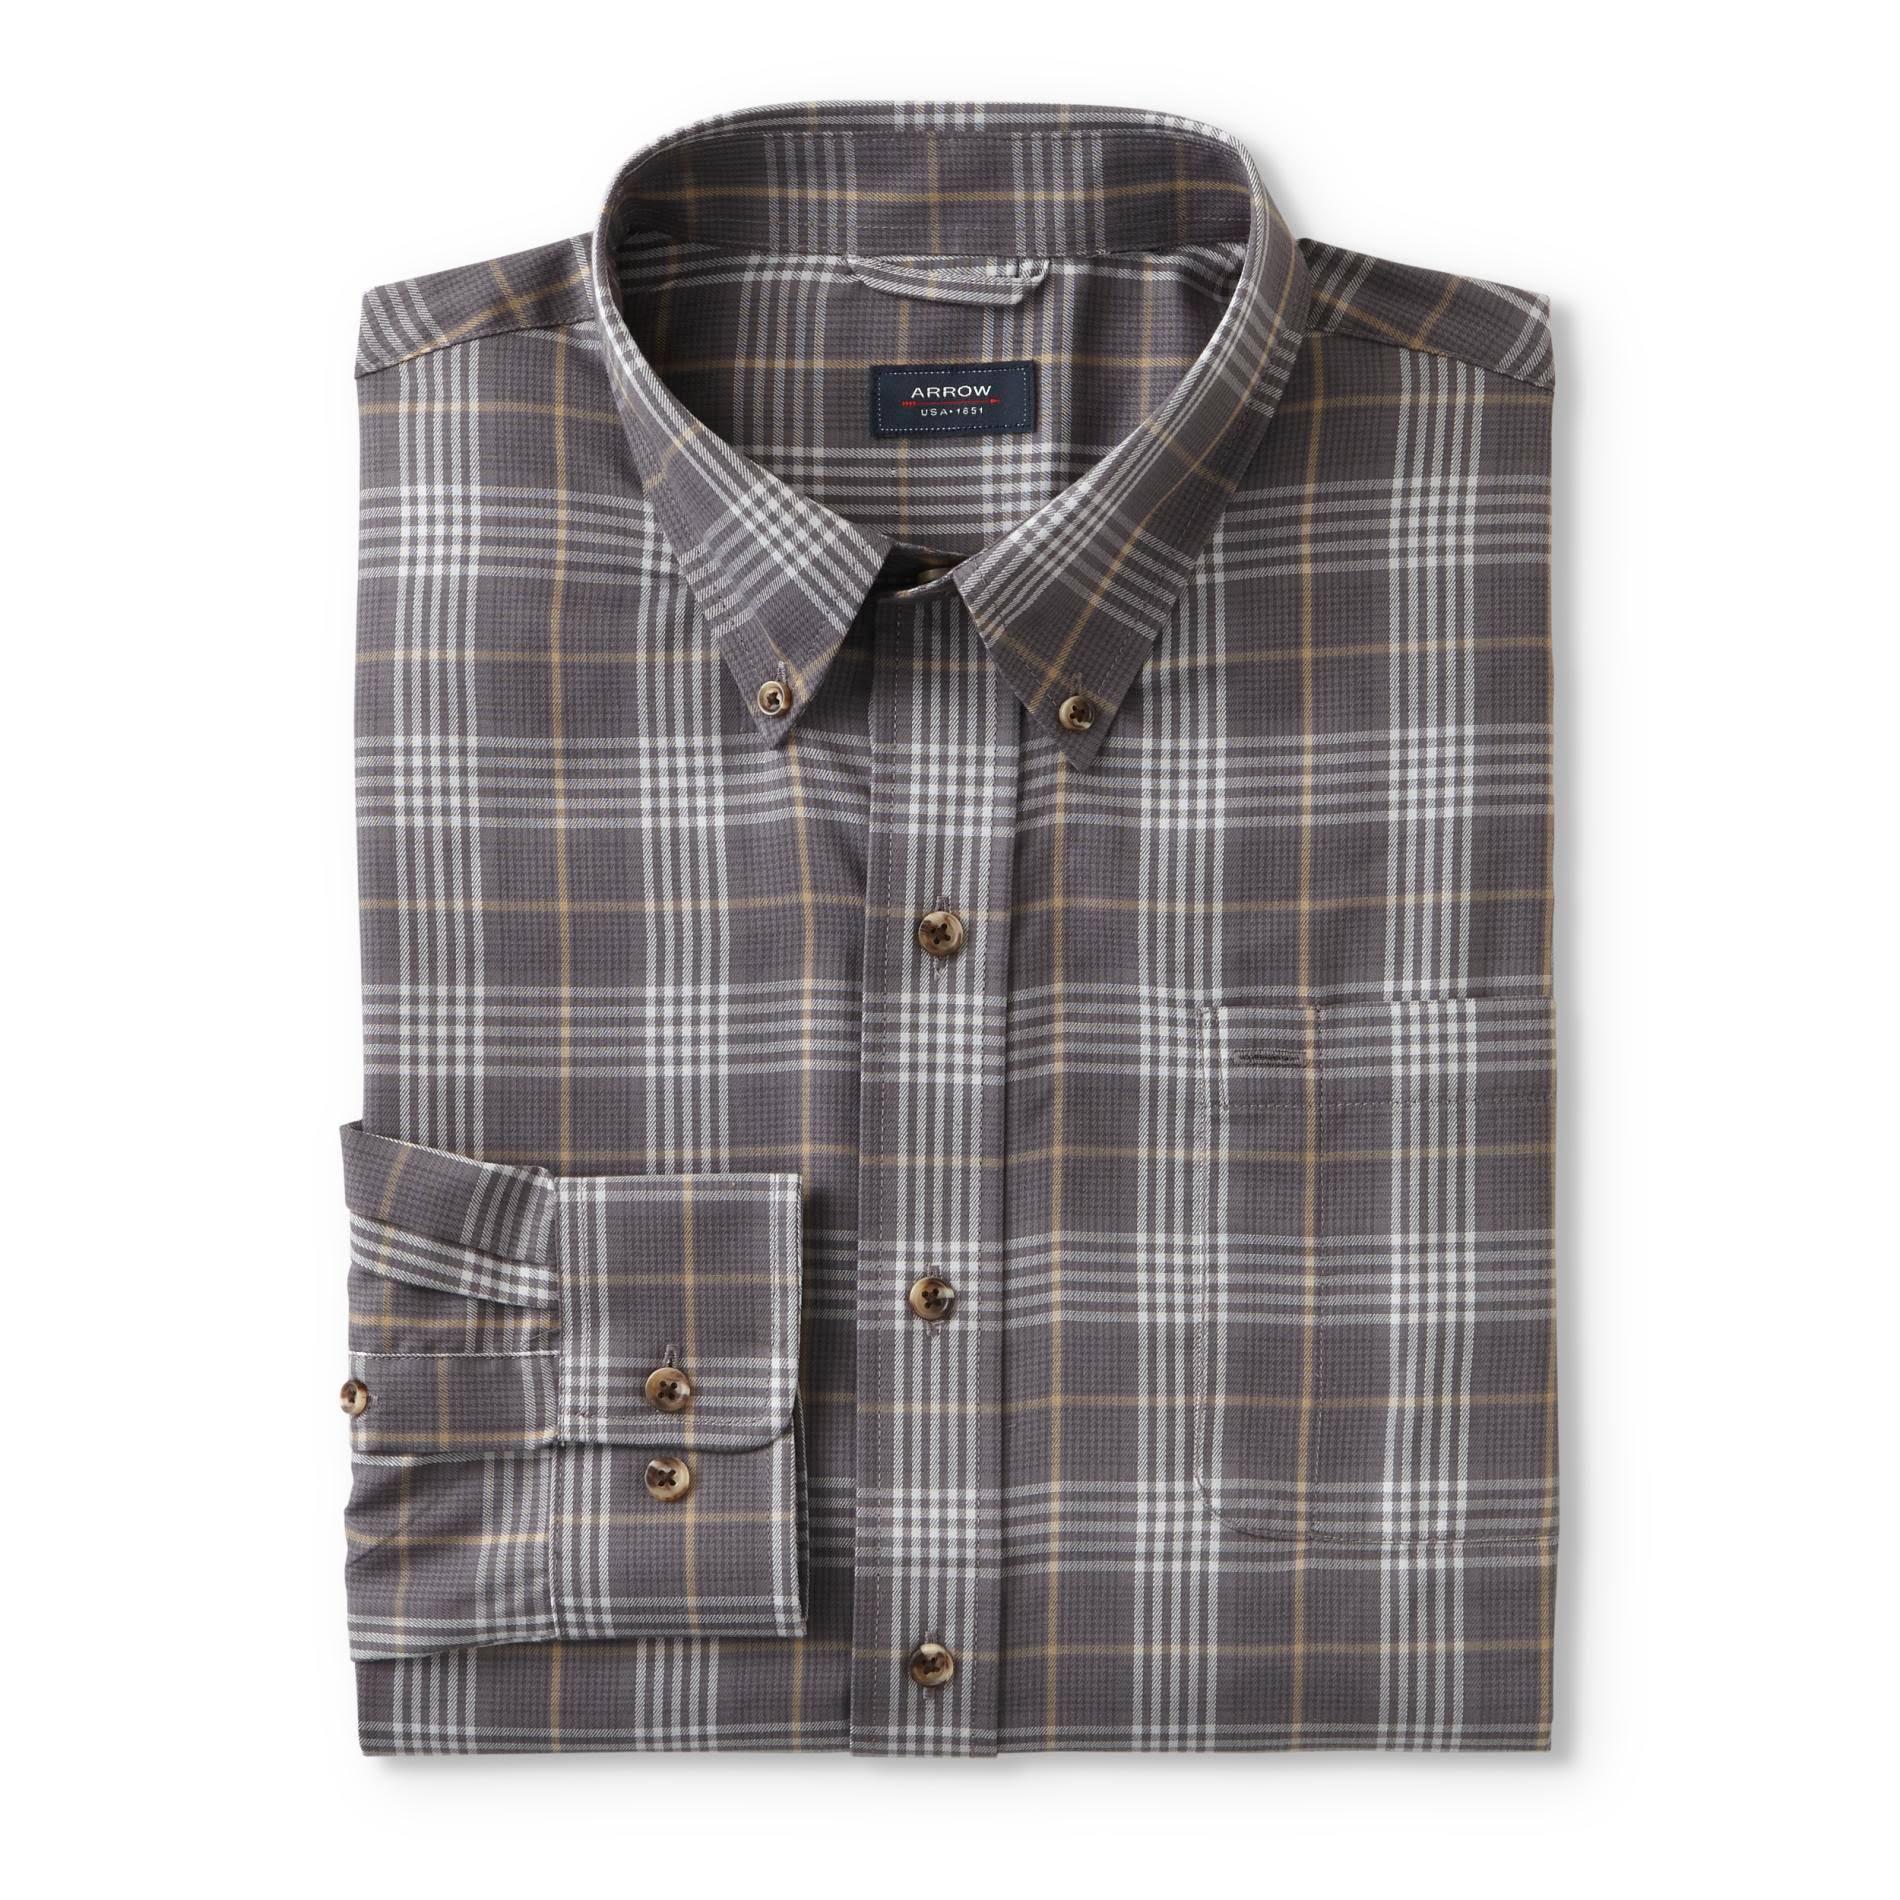 Castlerock Arrow kleid Größe plaid Medium Langarm Shirt Herren 0vq0BwZ